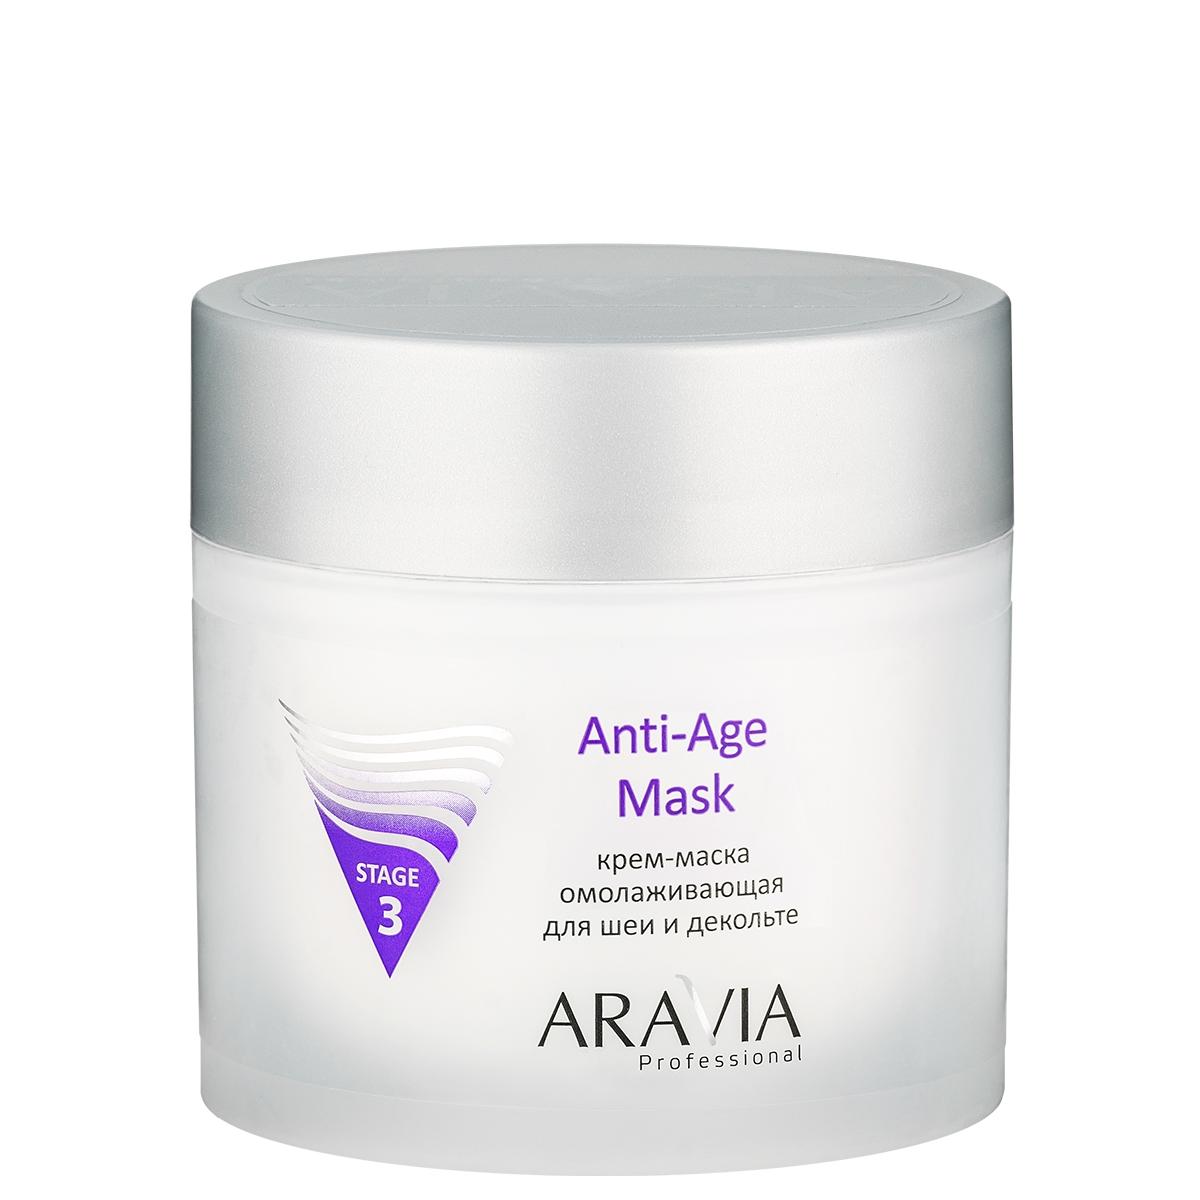 ARAVIA Крем-маска омолаживающая для шеи декольте Anti-Age Mask, 300 мл beauty style омолаживающая крем маска матриксил anti aging cream mask 50 мл